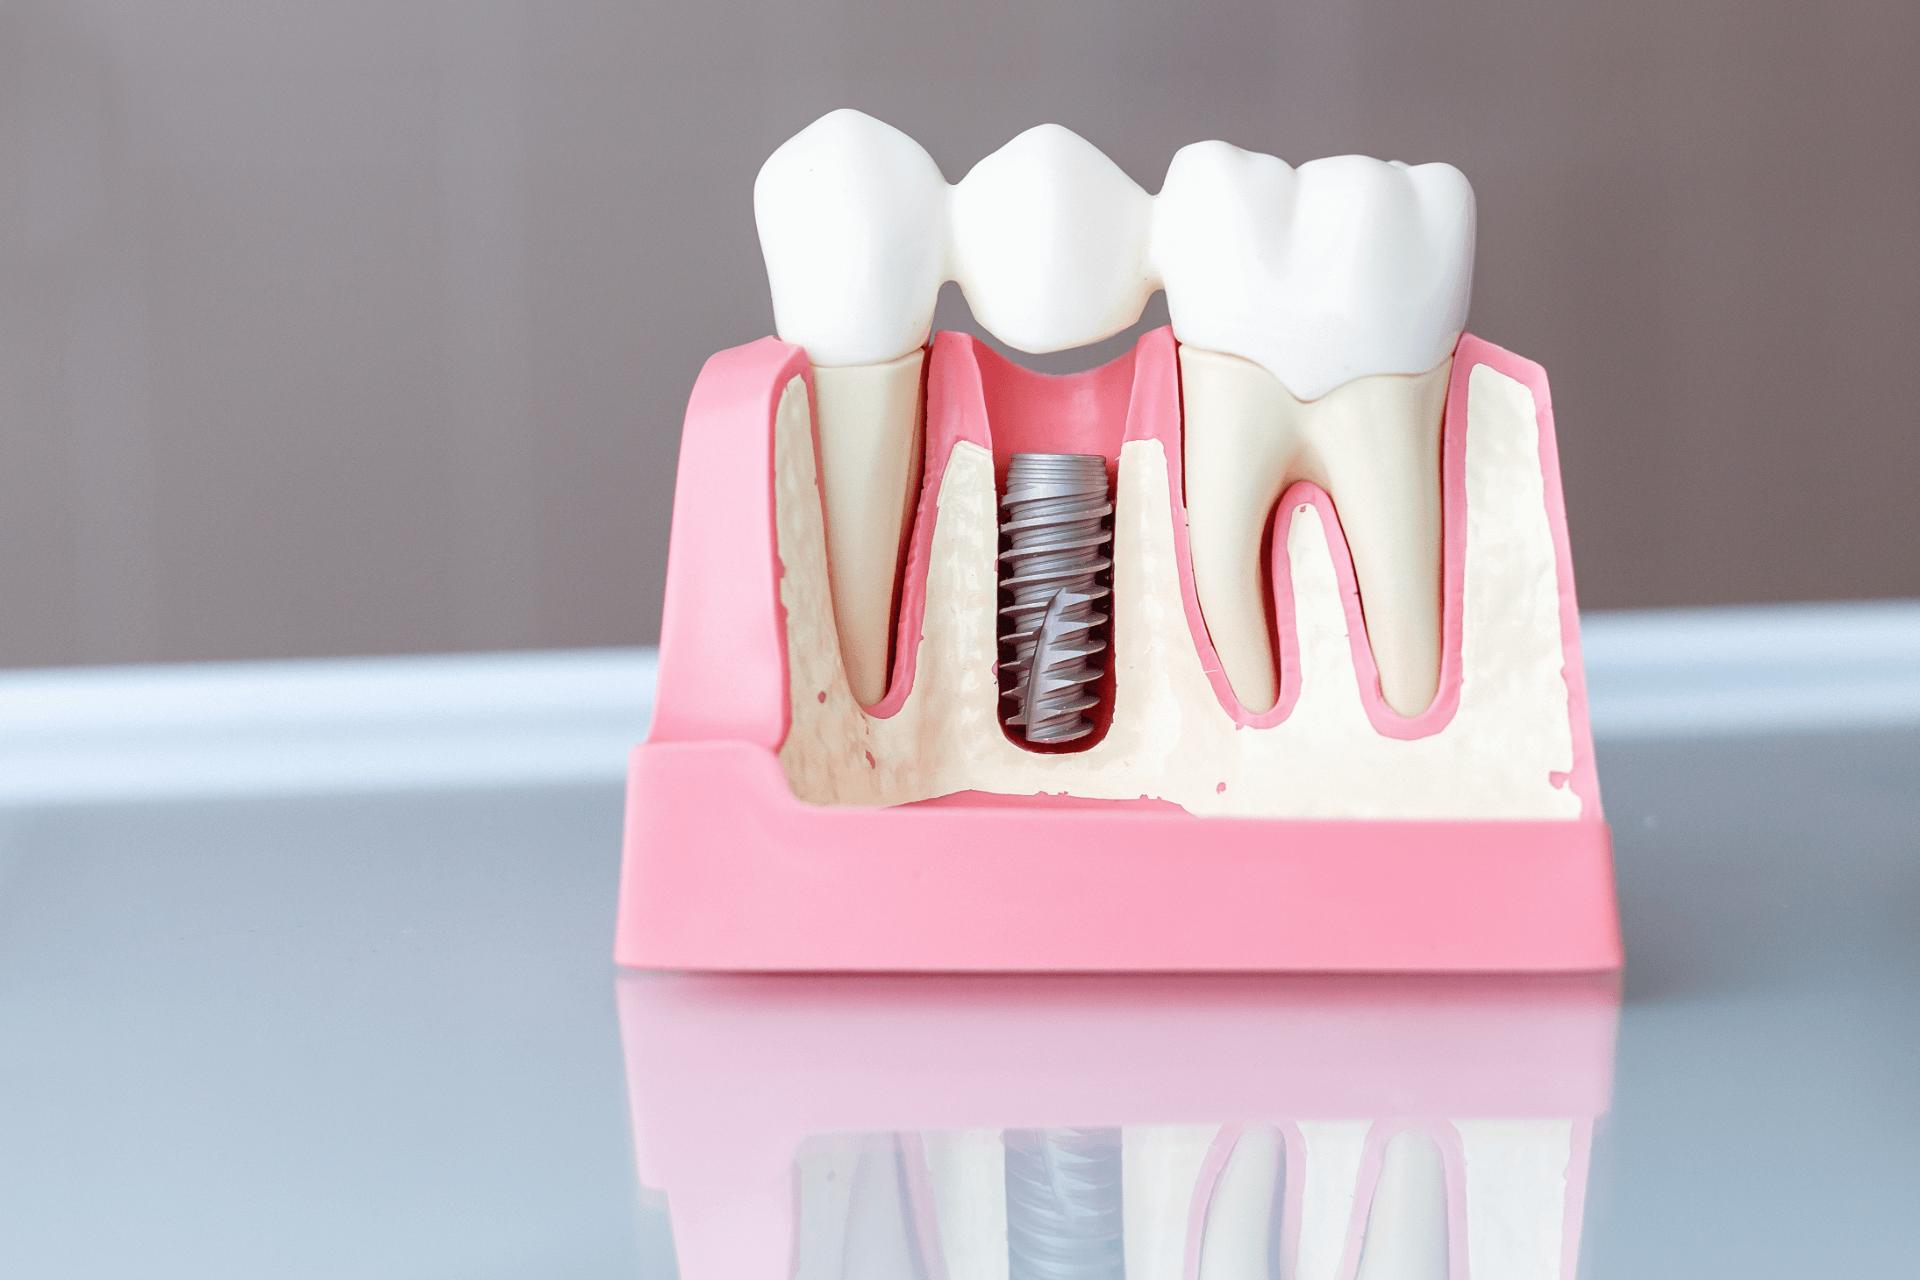 dental implants kingman az kingman family dentistry